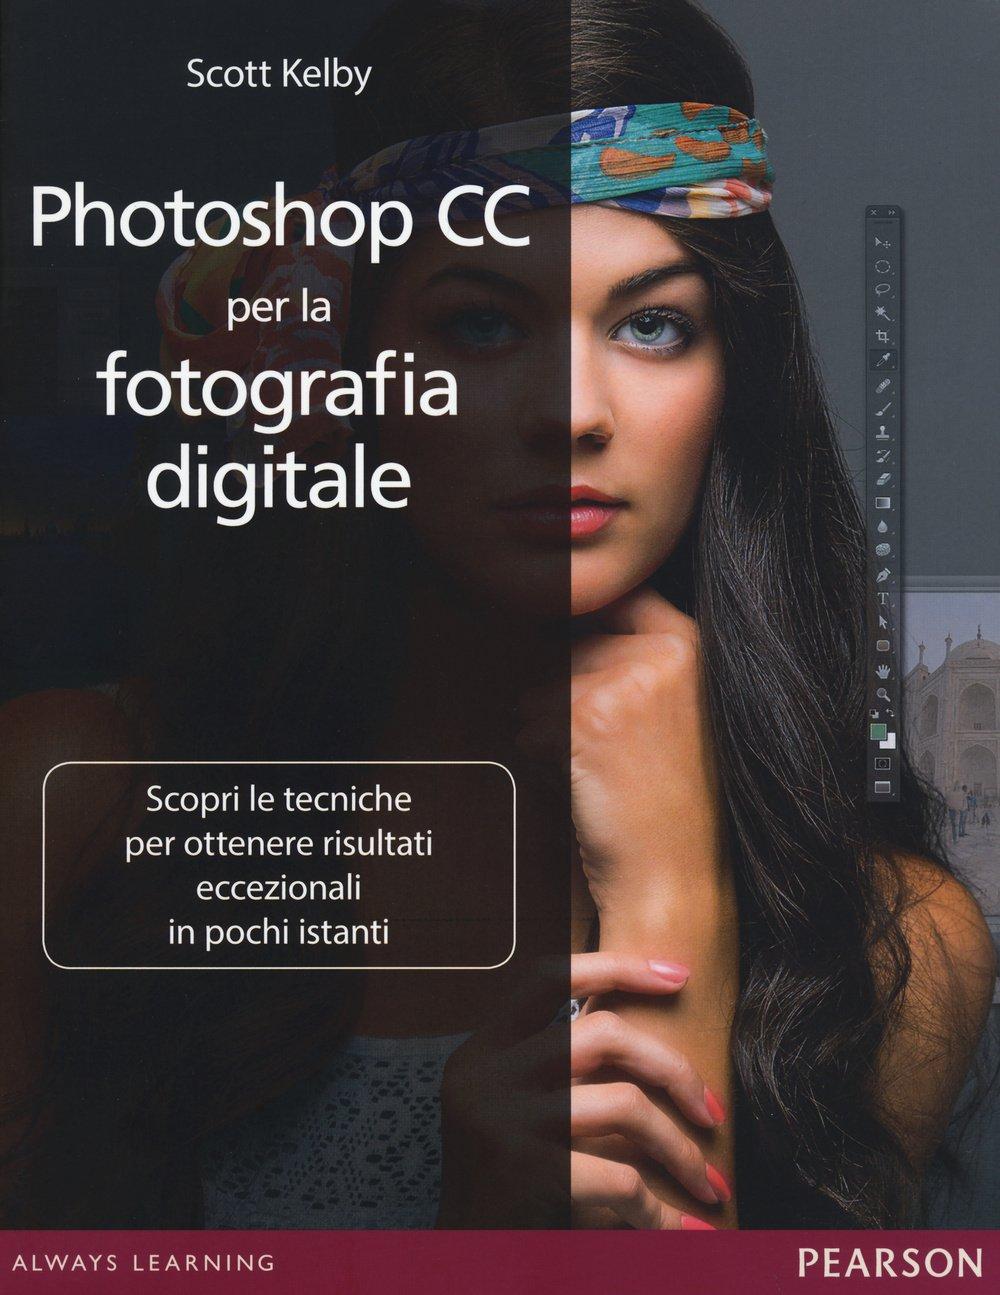 Photoshop CC per la fotografia digitale Copertina flessibile – 17 set 2015 Scott Kelby P. Postinghel Pearson 8865189711